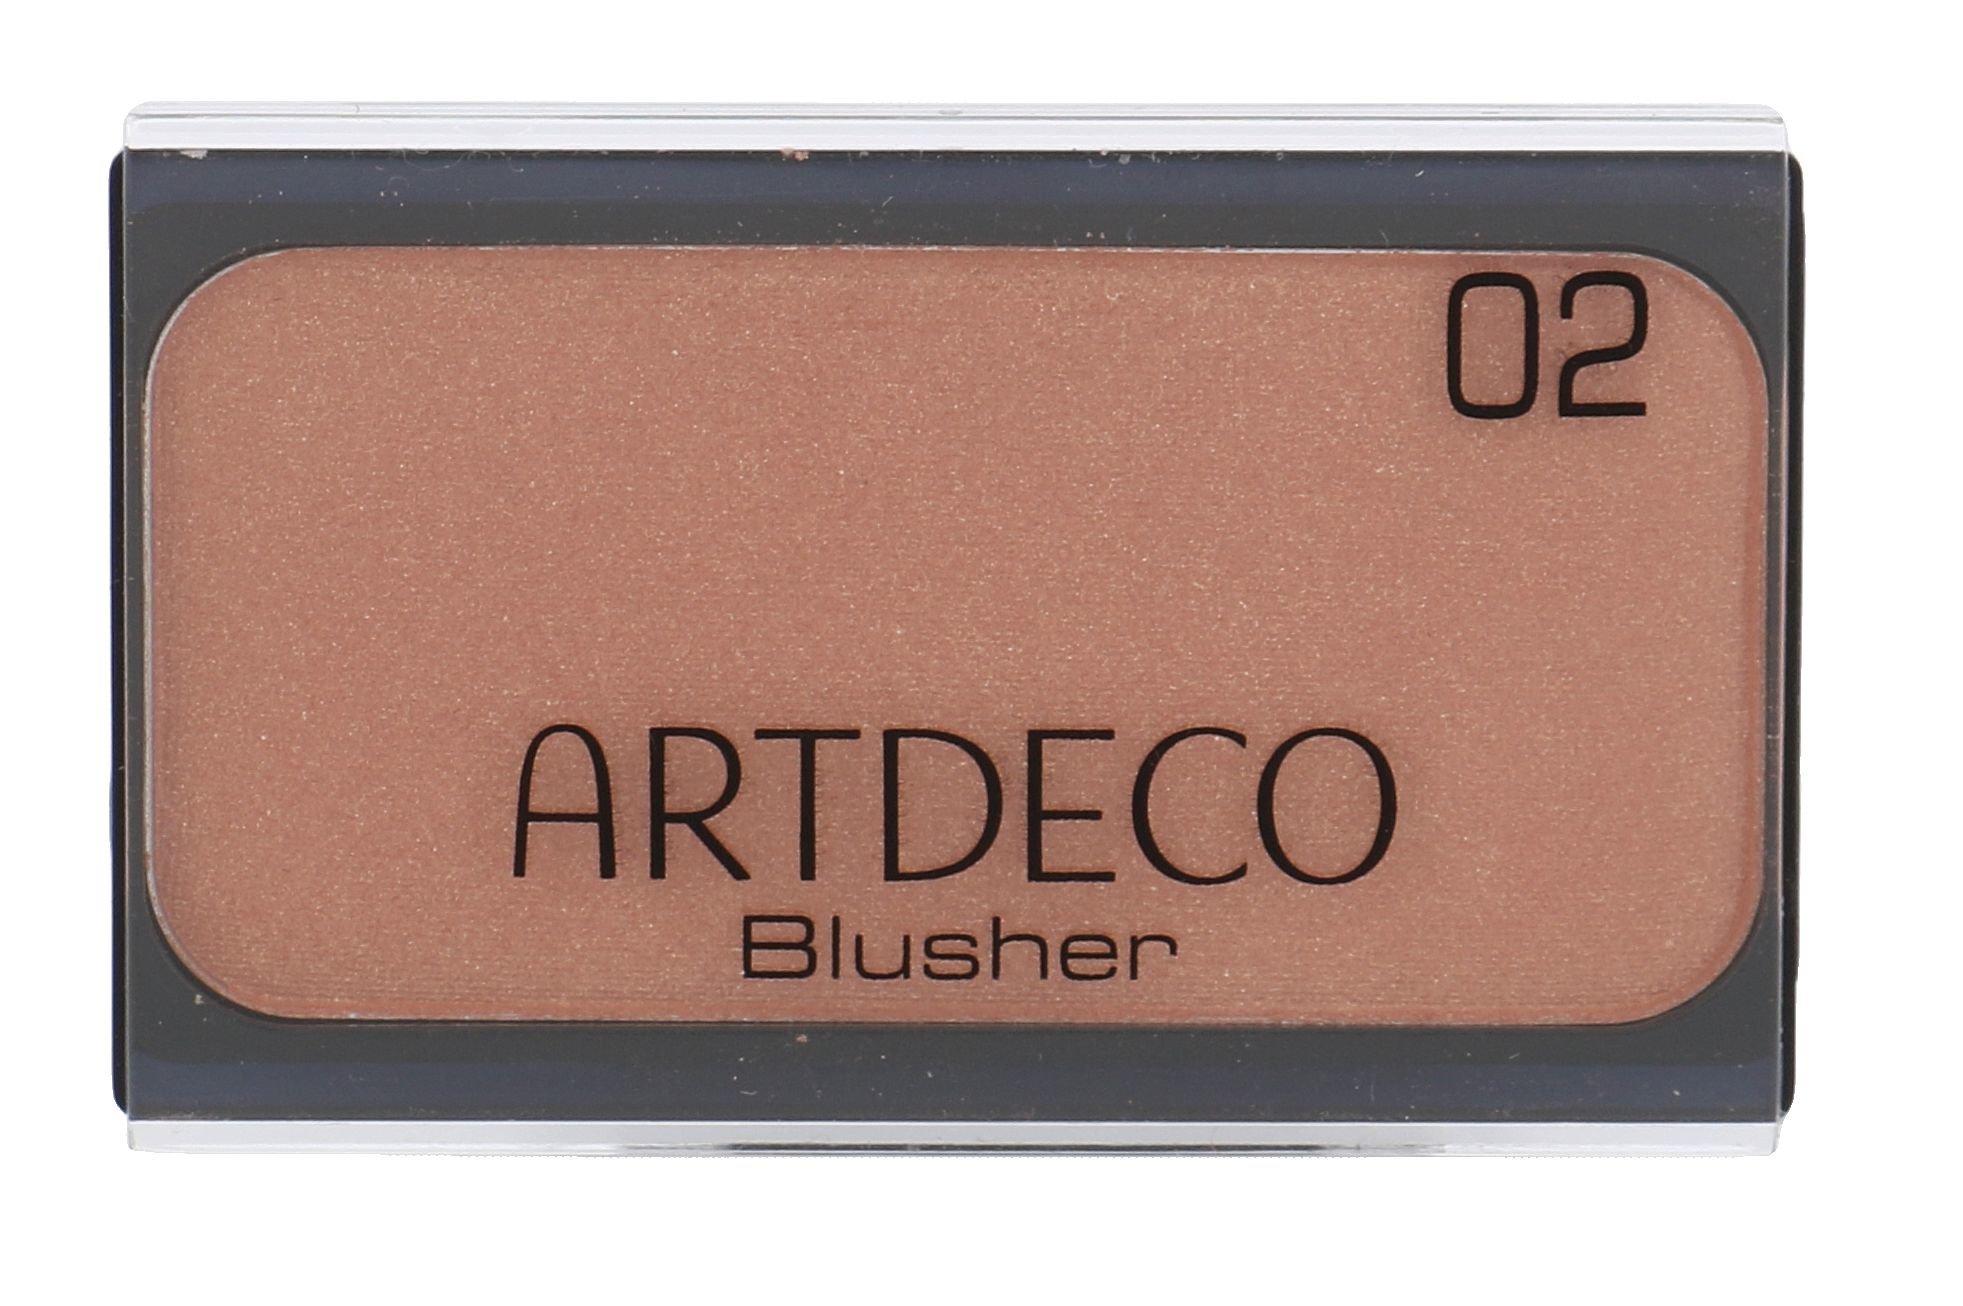 Artdeco Blusher Cosmetic 5ml 02 Deep Brown Orange Blush